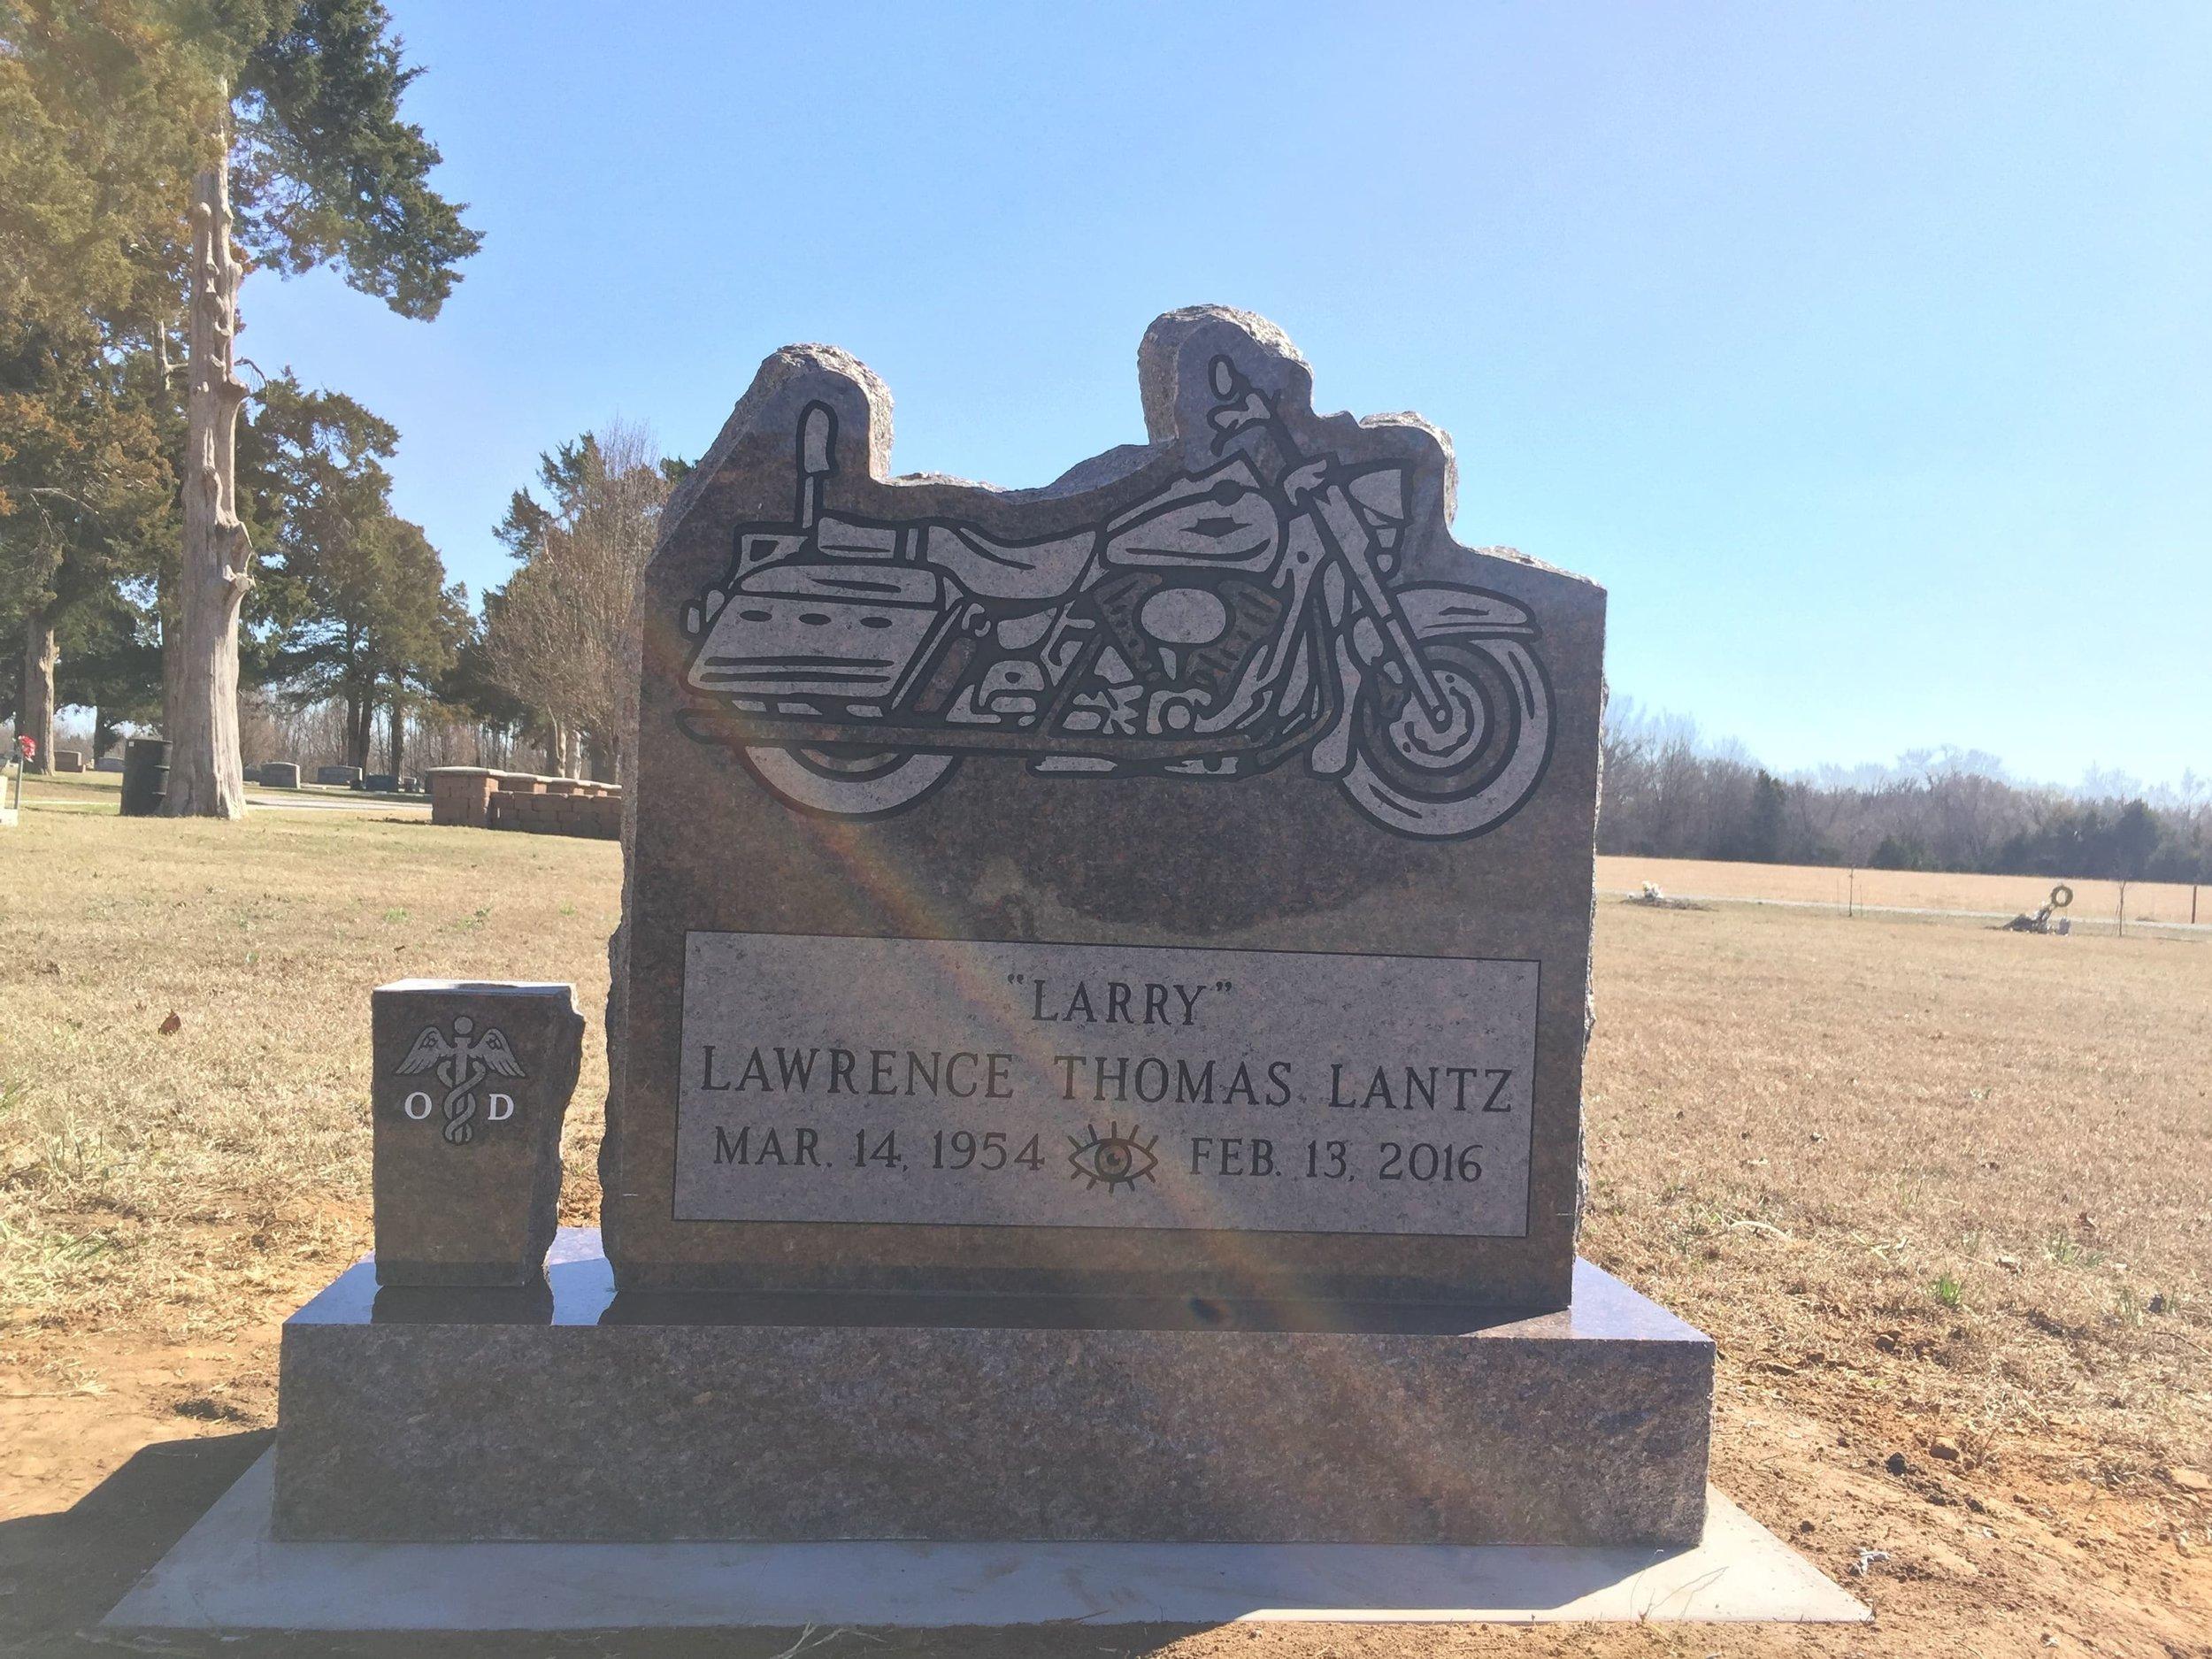 70. Calvery Cemetery, Shawnee OK